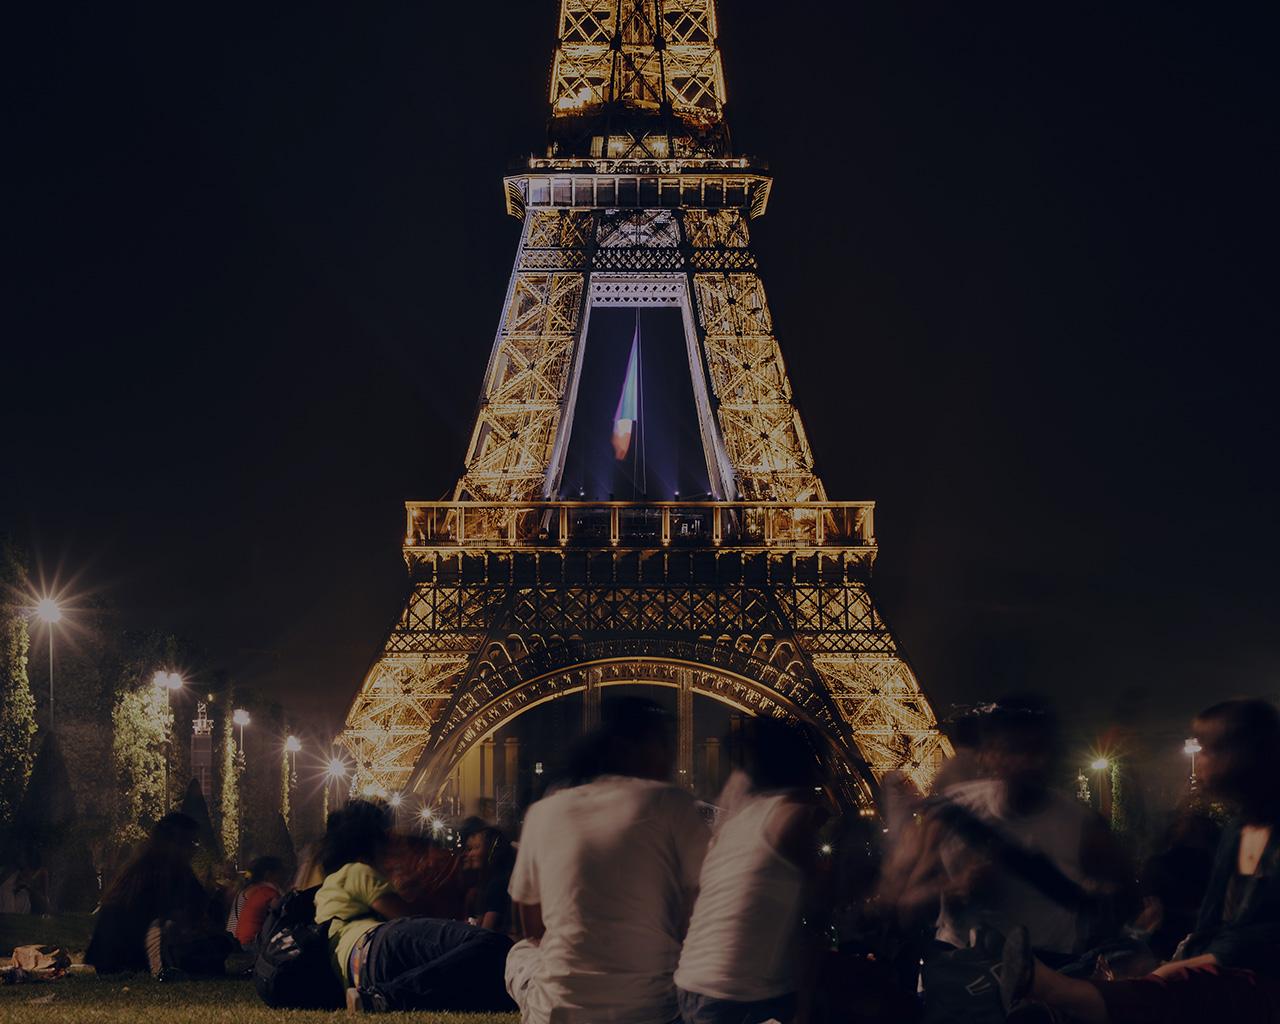 Happy Fall Wallpaper Iphone Ms40 Happy Paris Eiffel Tower France Tour Night City